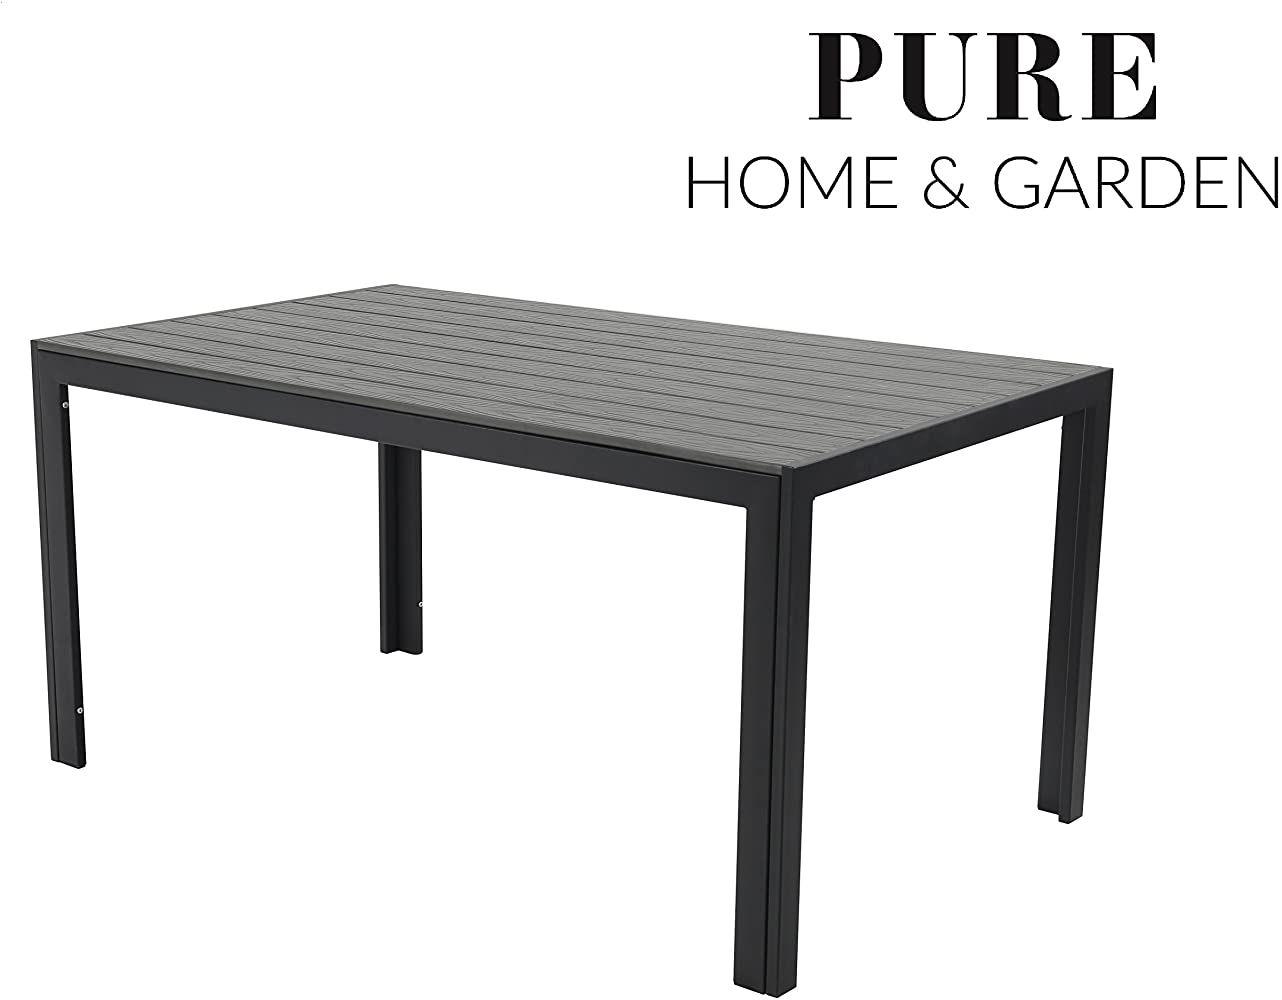 Pure Home Garden Aluminium Gartentisch Fire Xxl Mit Polywood